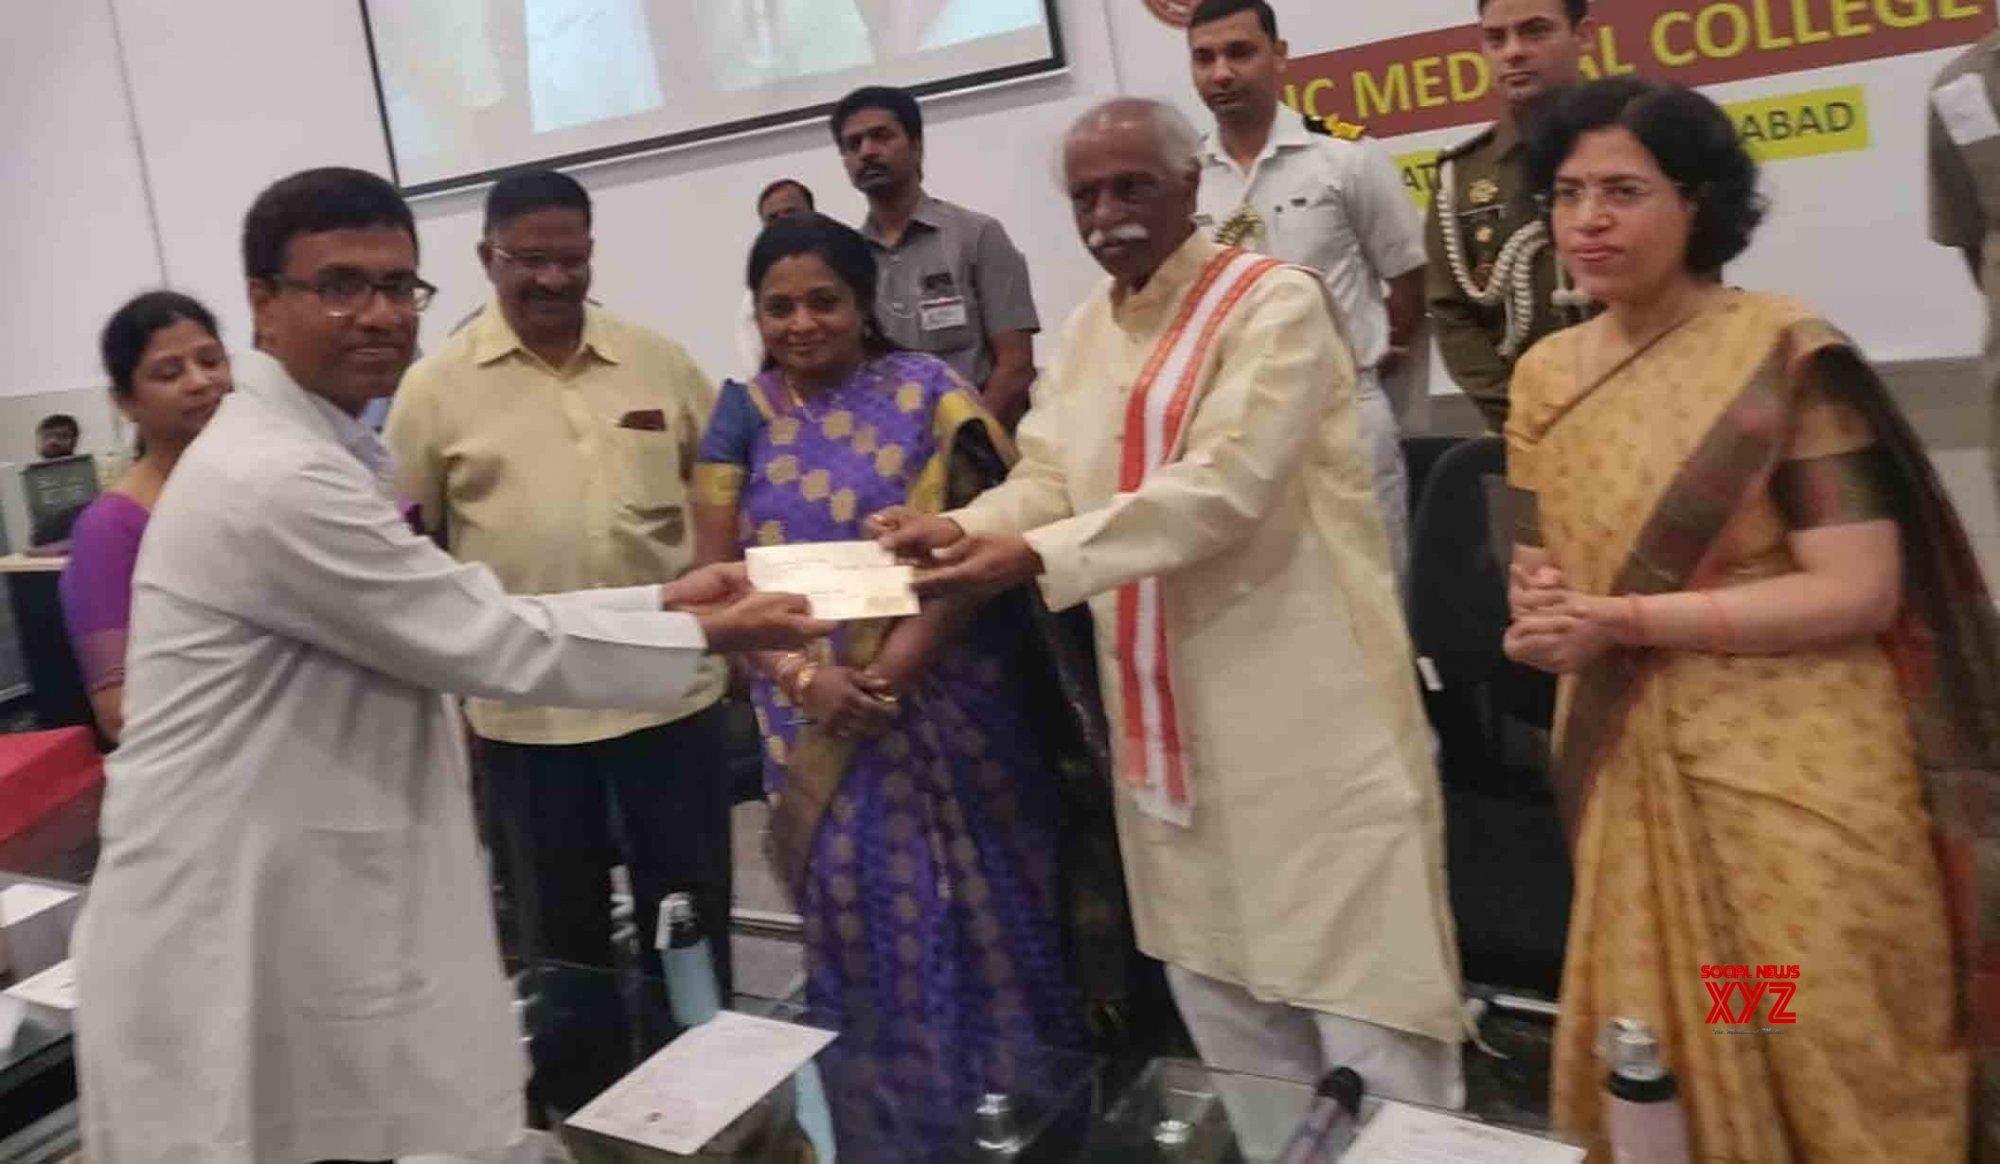 Hyderabad: Tamilisai Soundararajan, Bandaru Dattatreya at ESIC Medical College and Hospital #Gallery